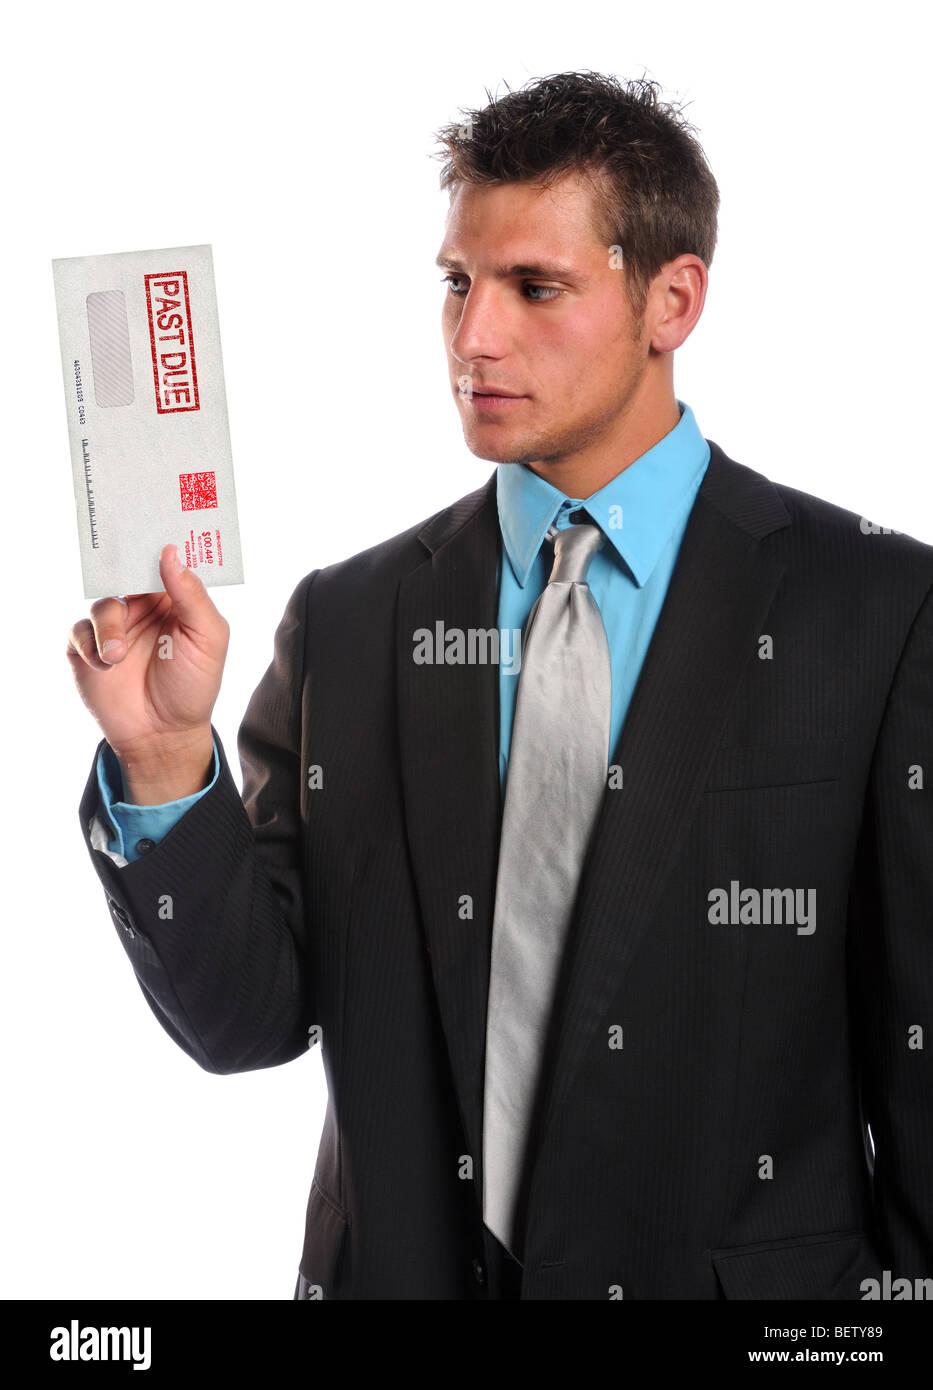 Businessman holding past due envelope isolated over white background - Stock Image